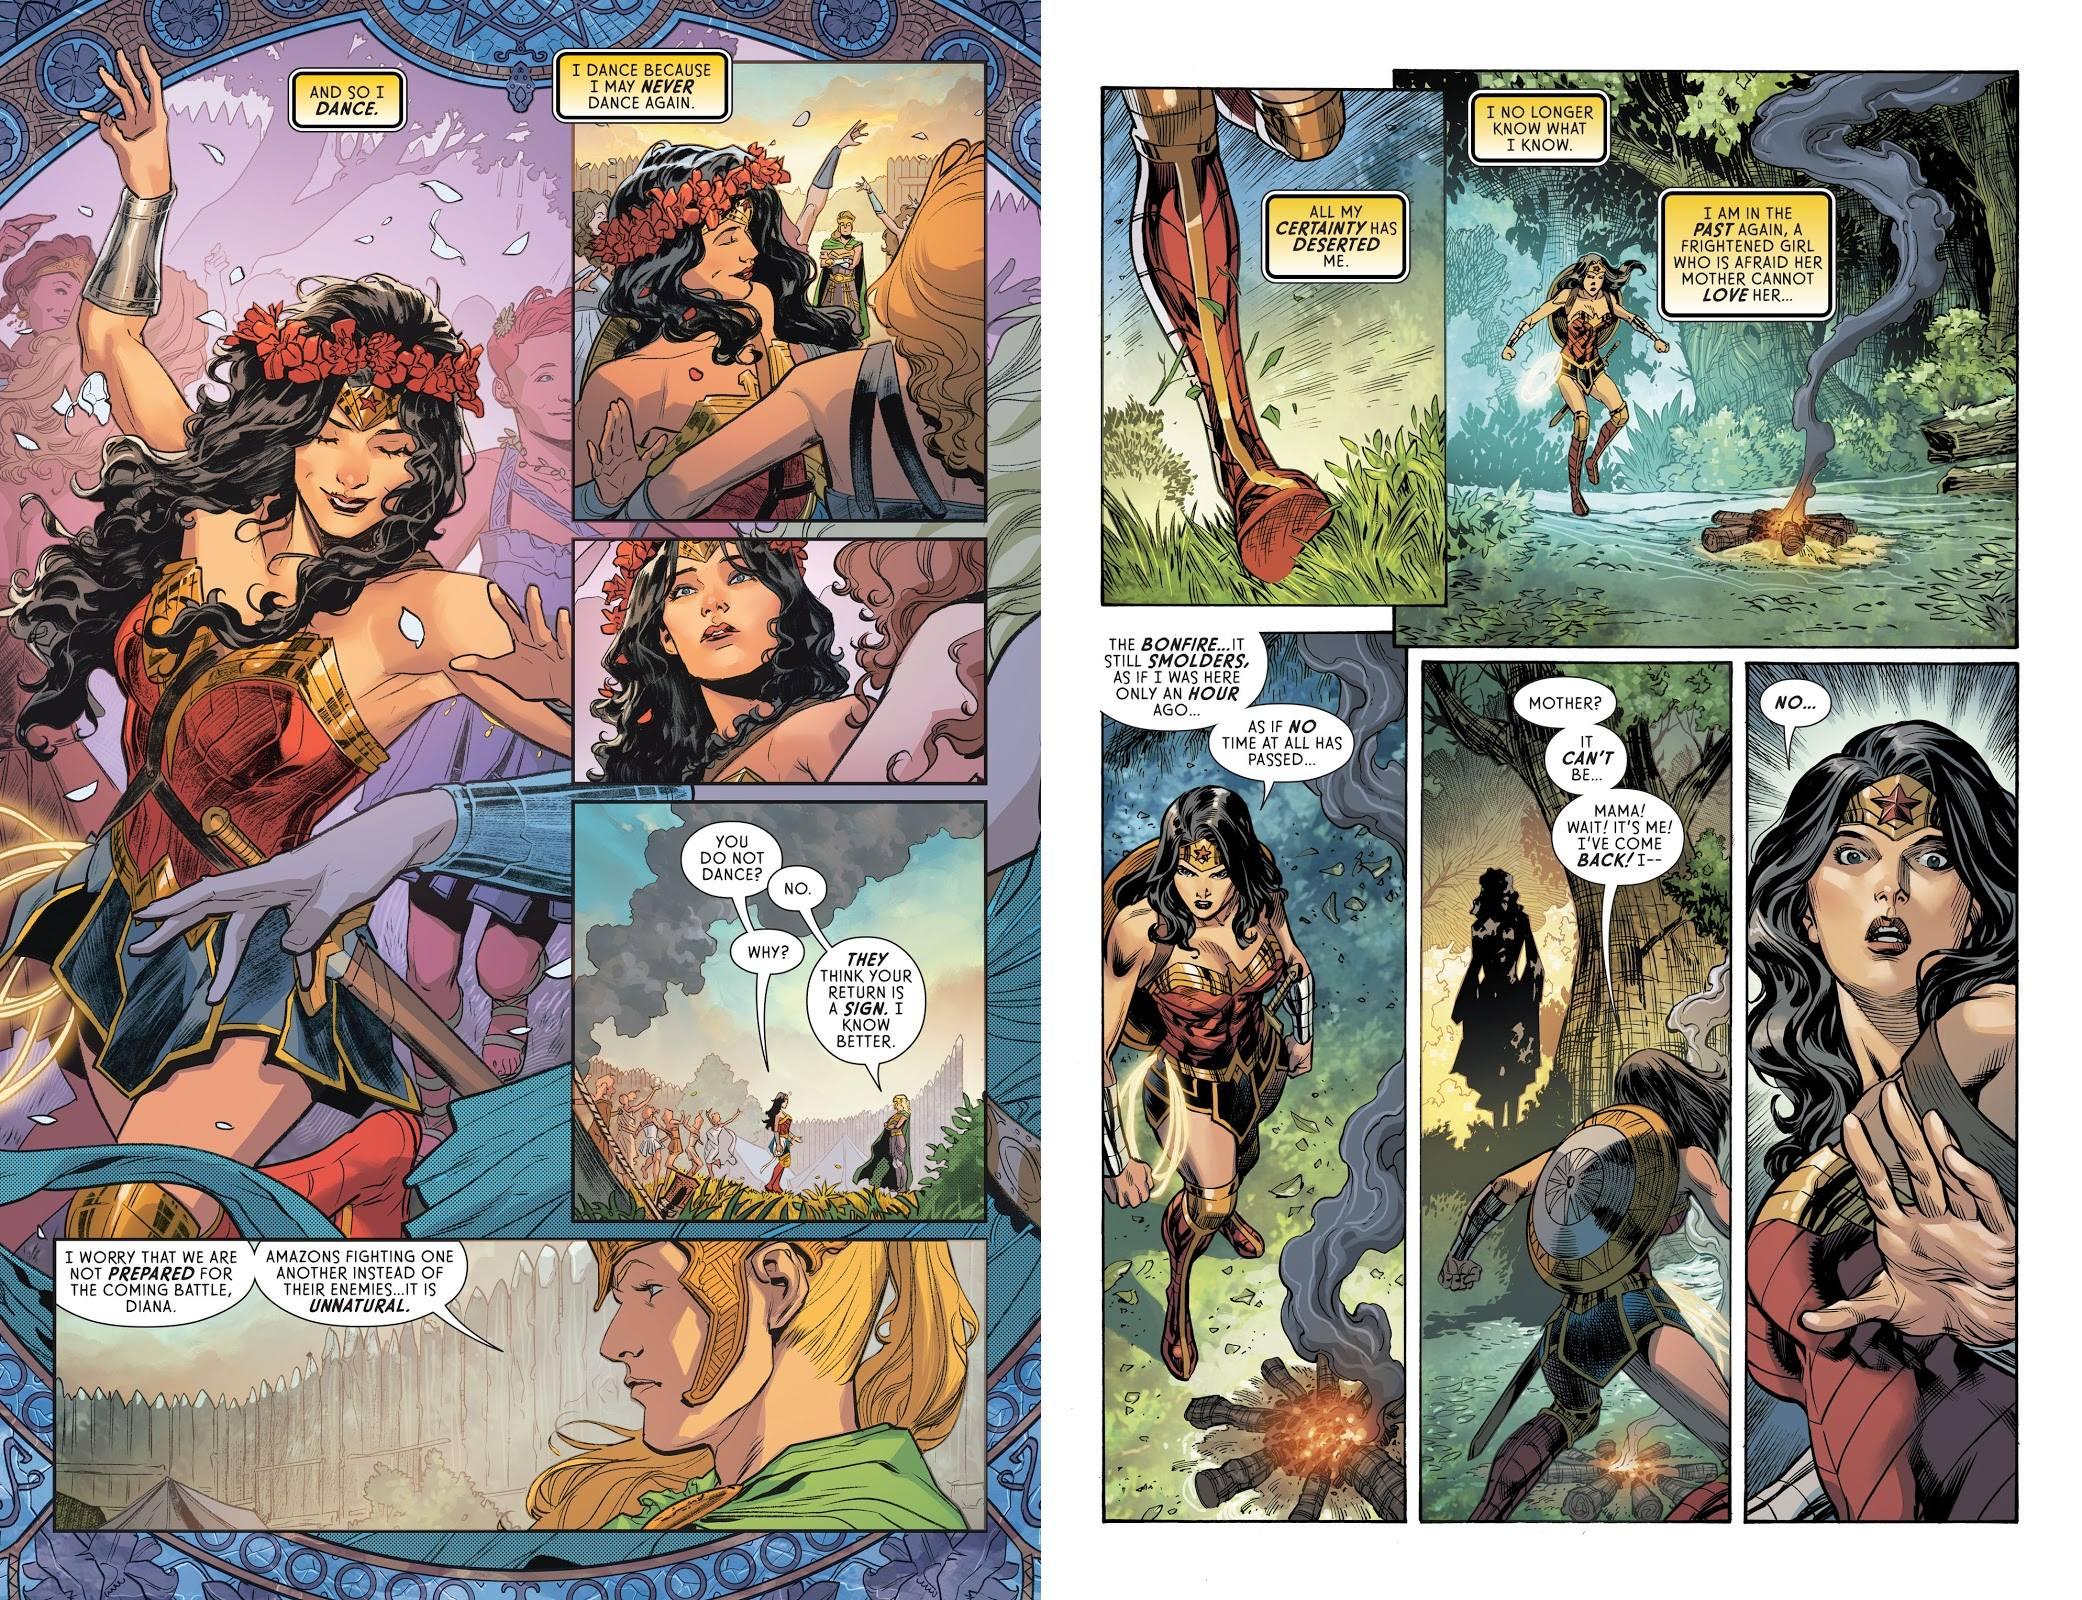 Wonder Woman Loveless review